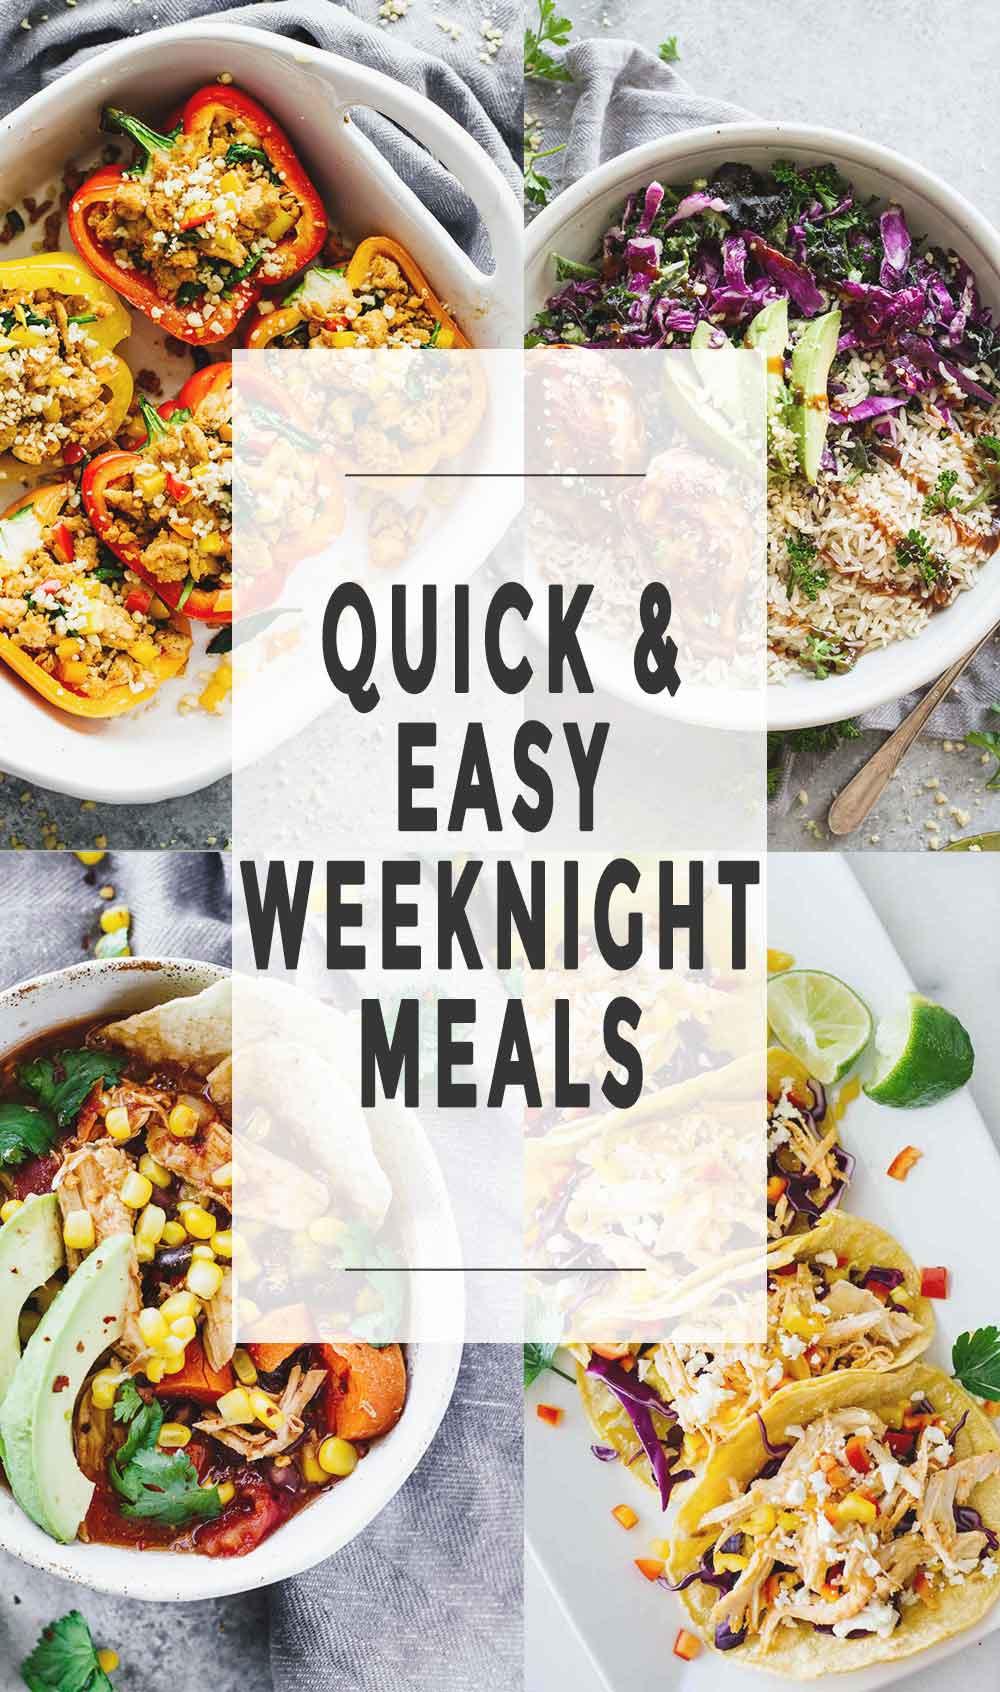 Quick Healthy Weeknight Dinners  Quick & Easy Weeknight Meals Jar Lemons